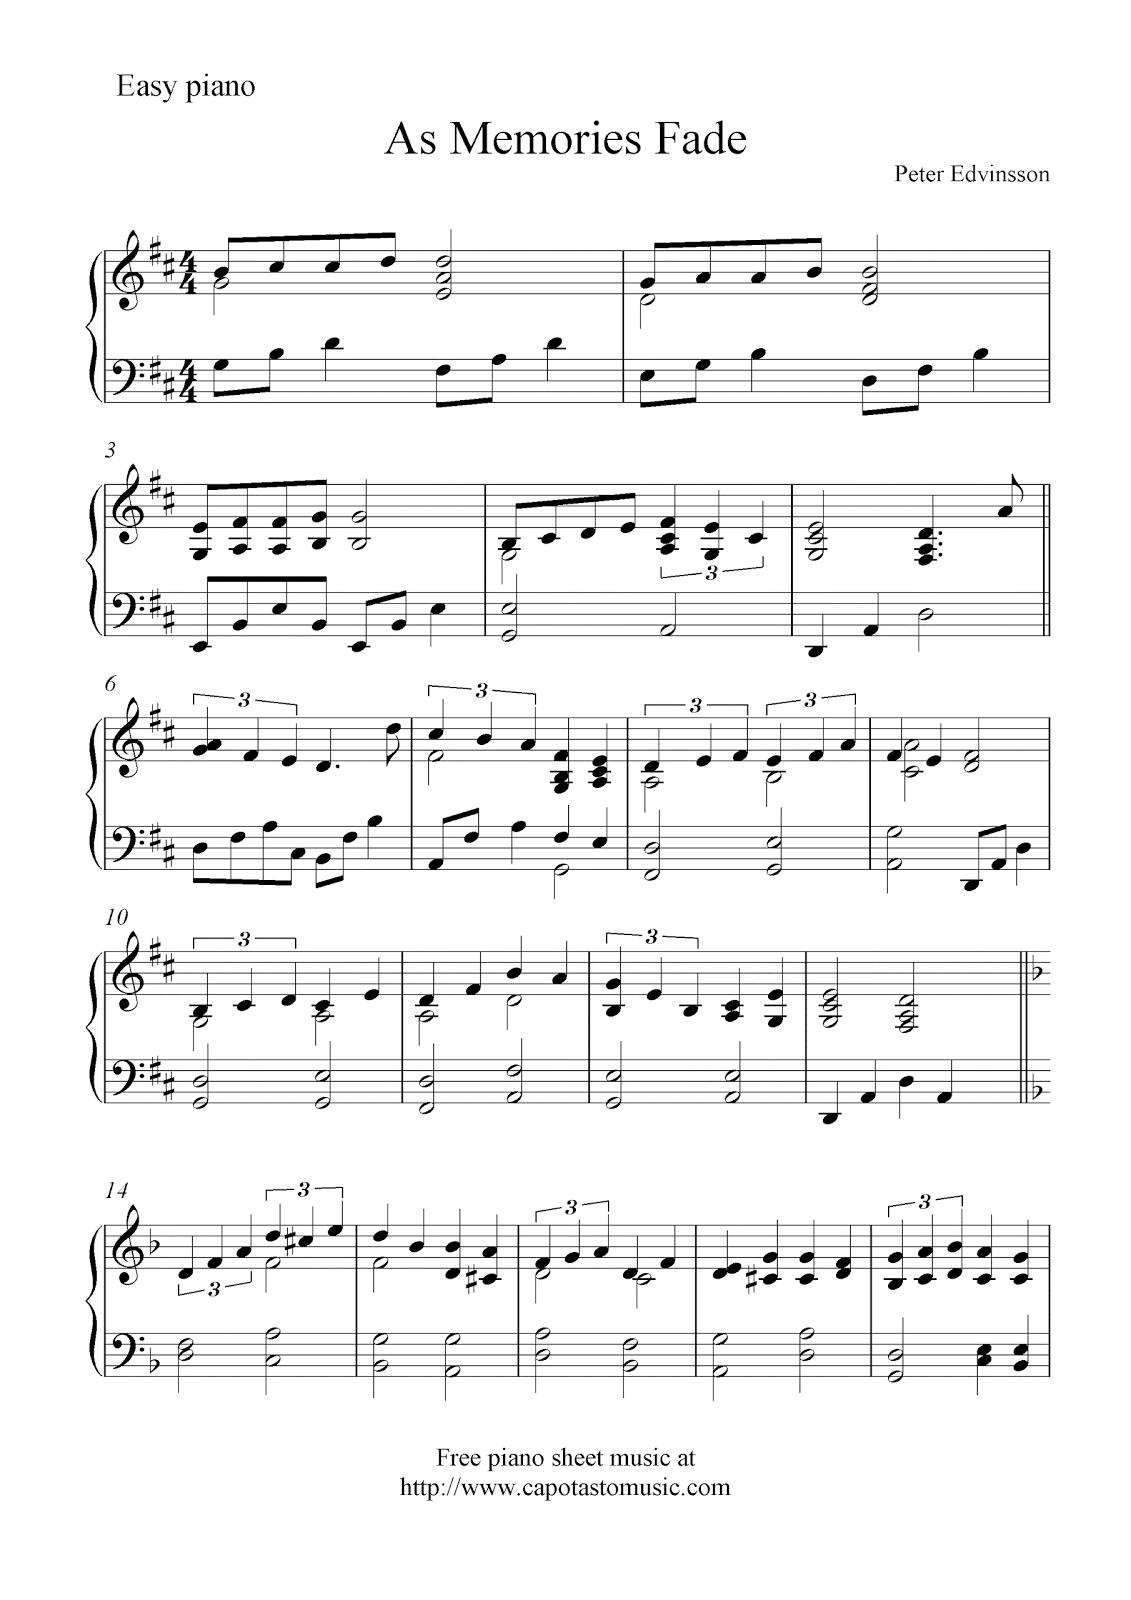 Easy piano sheet music free easy piano sheet music